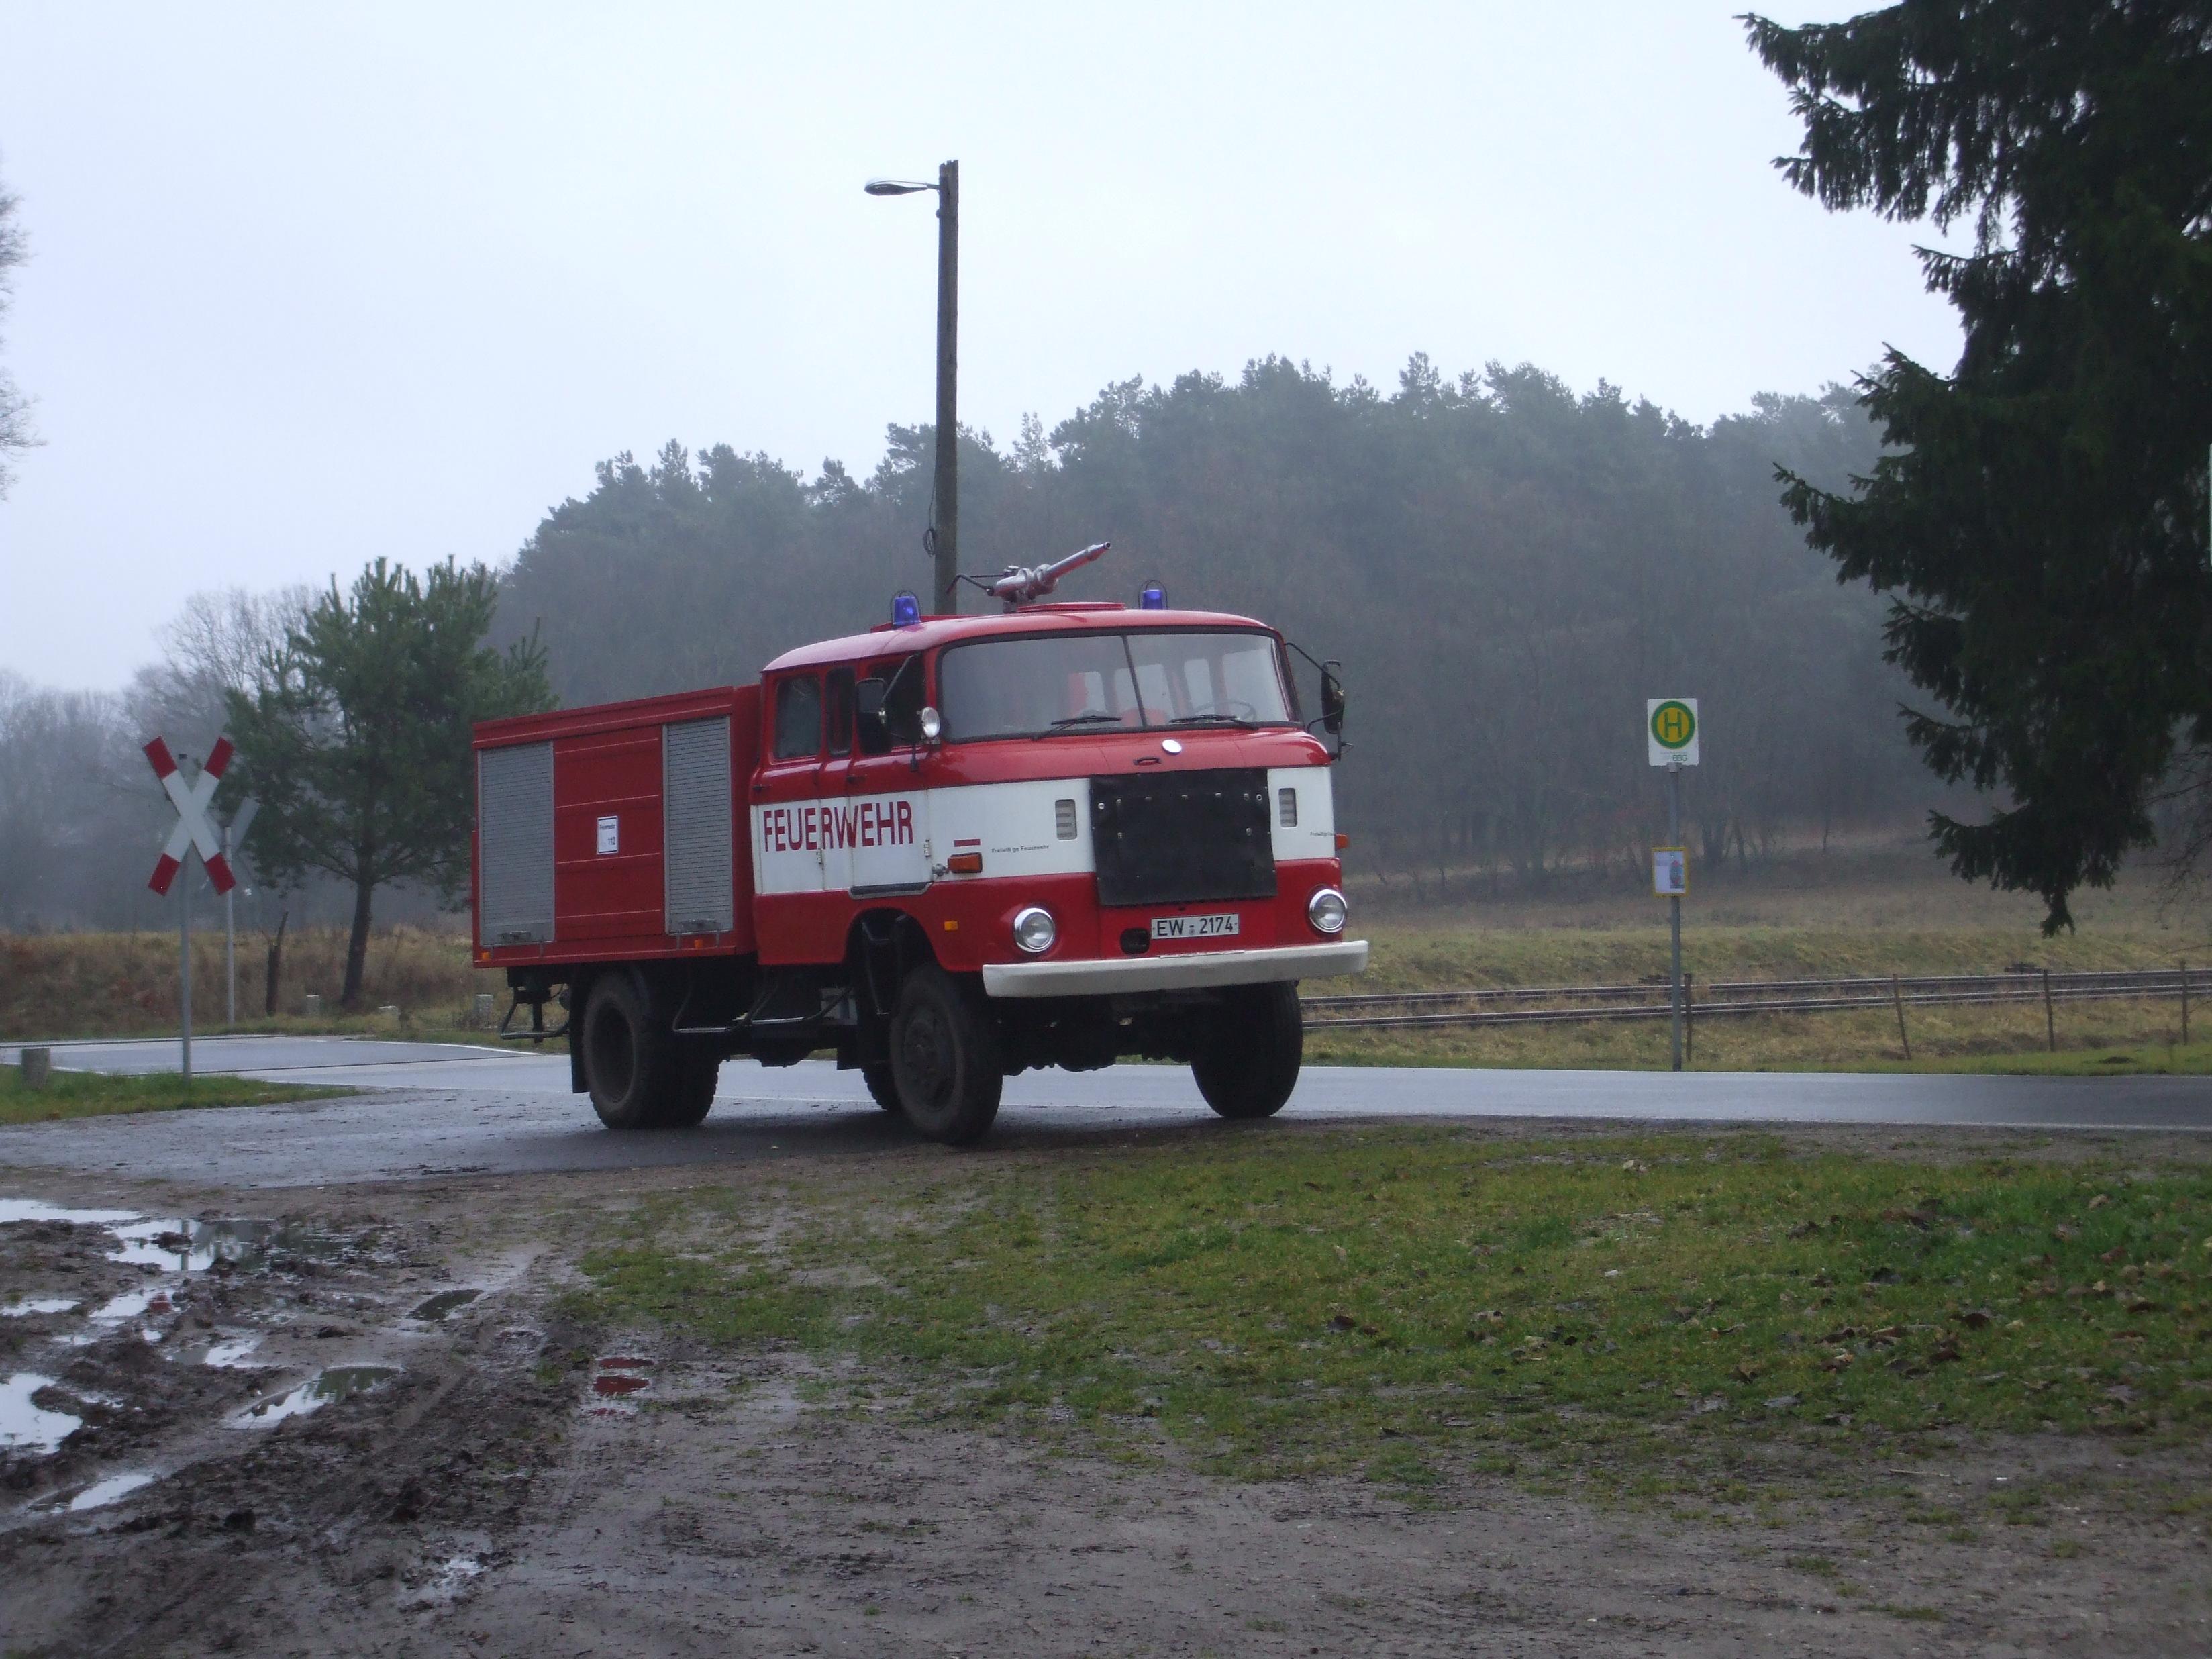 Feuerwehrauto Profilbild